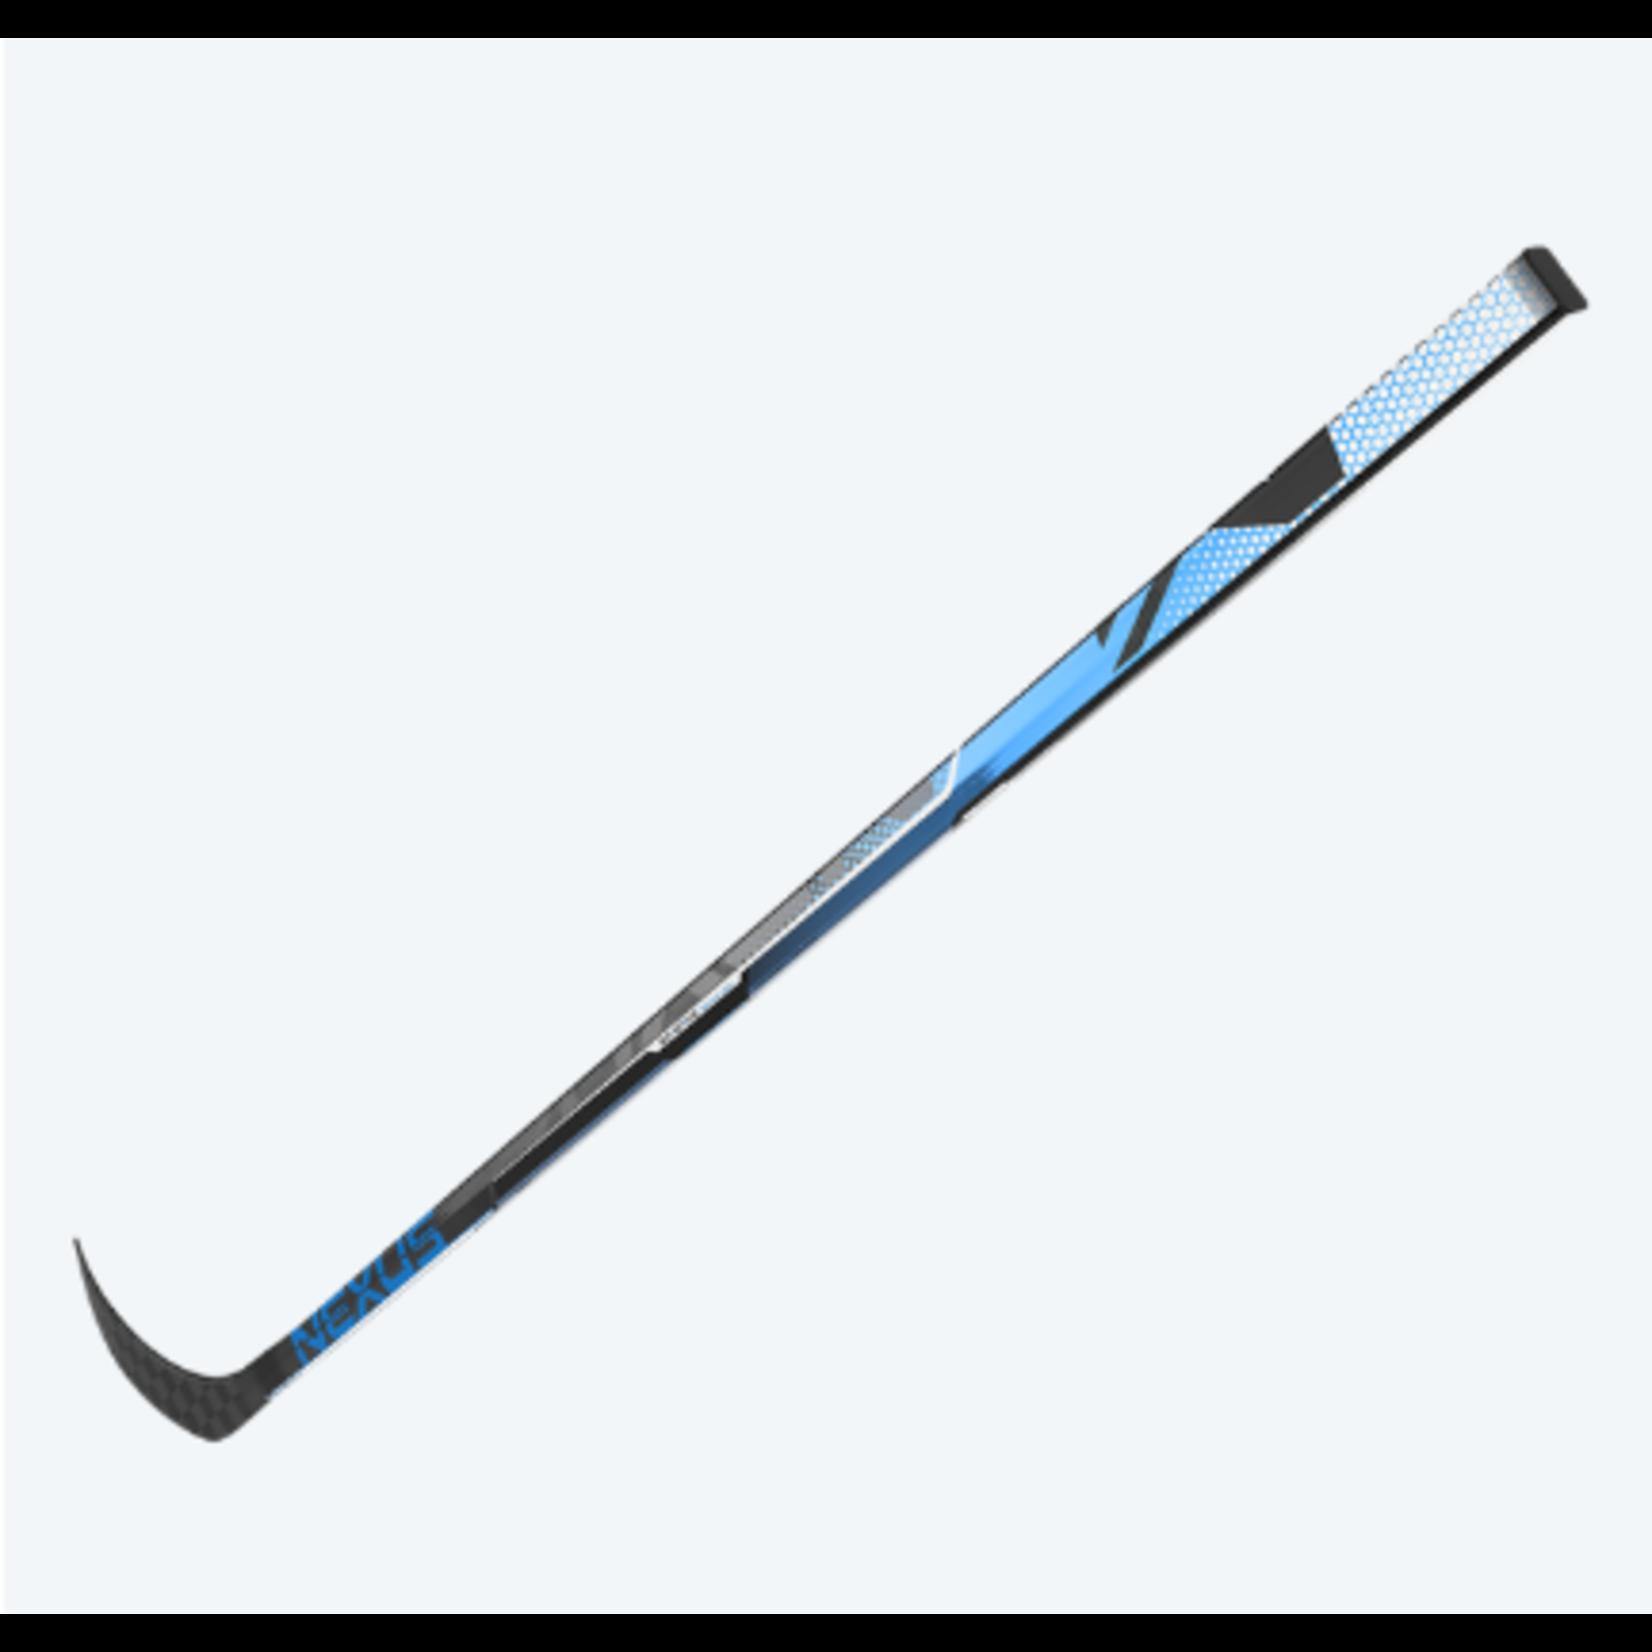 S21 Nexus 3N Pro Grip Stick Sr - 70